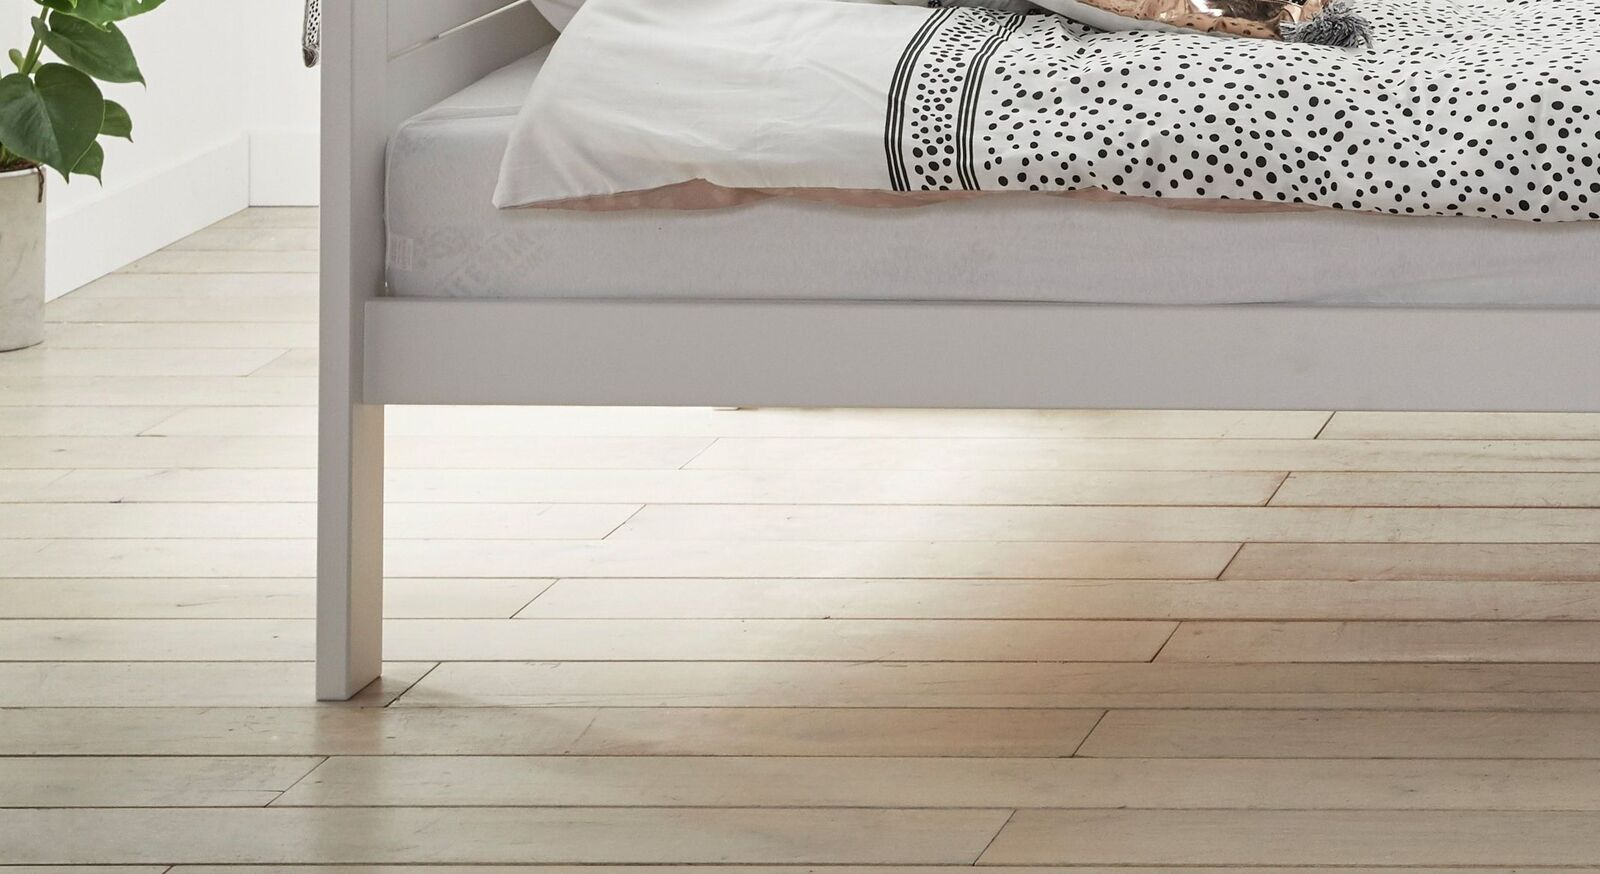 LIFETIME Himmelbett Living Style mit schmalem Bettrahmen